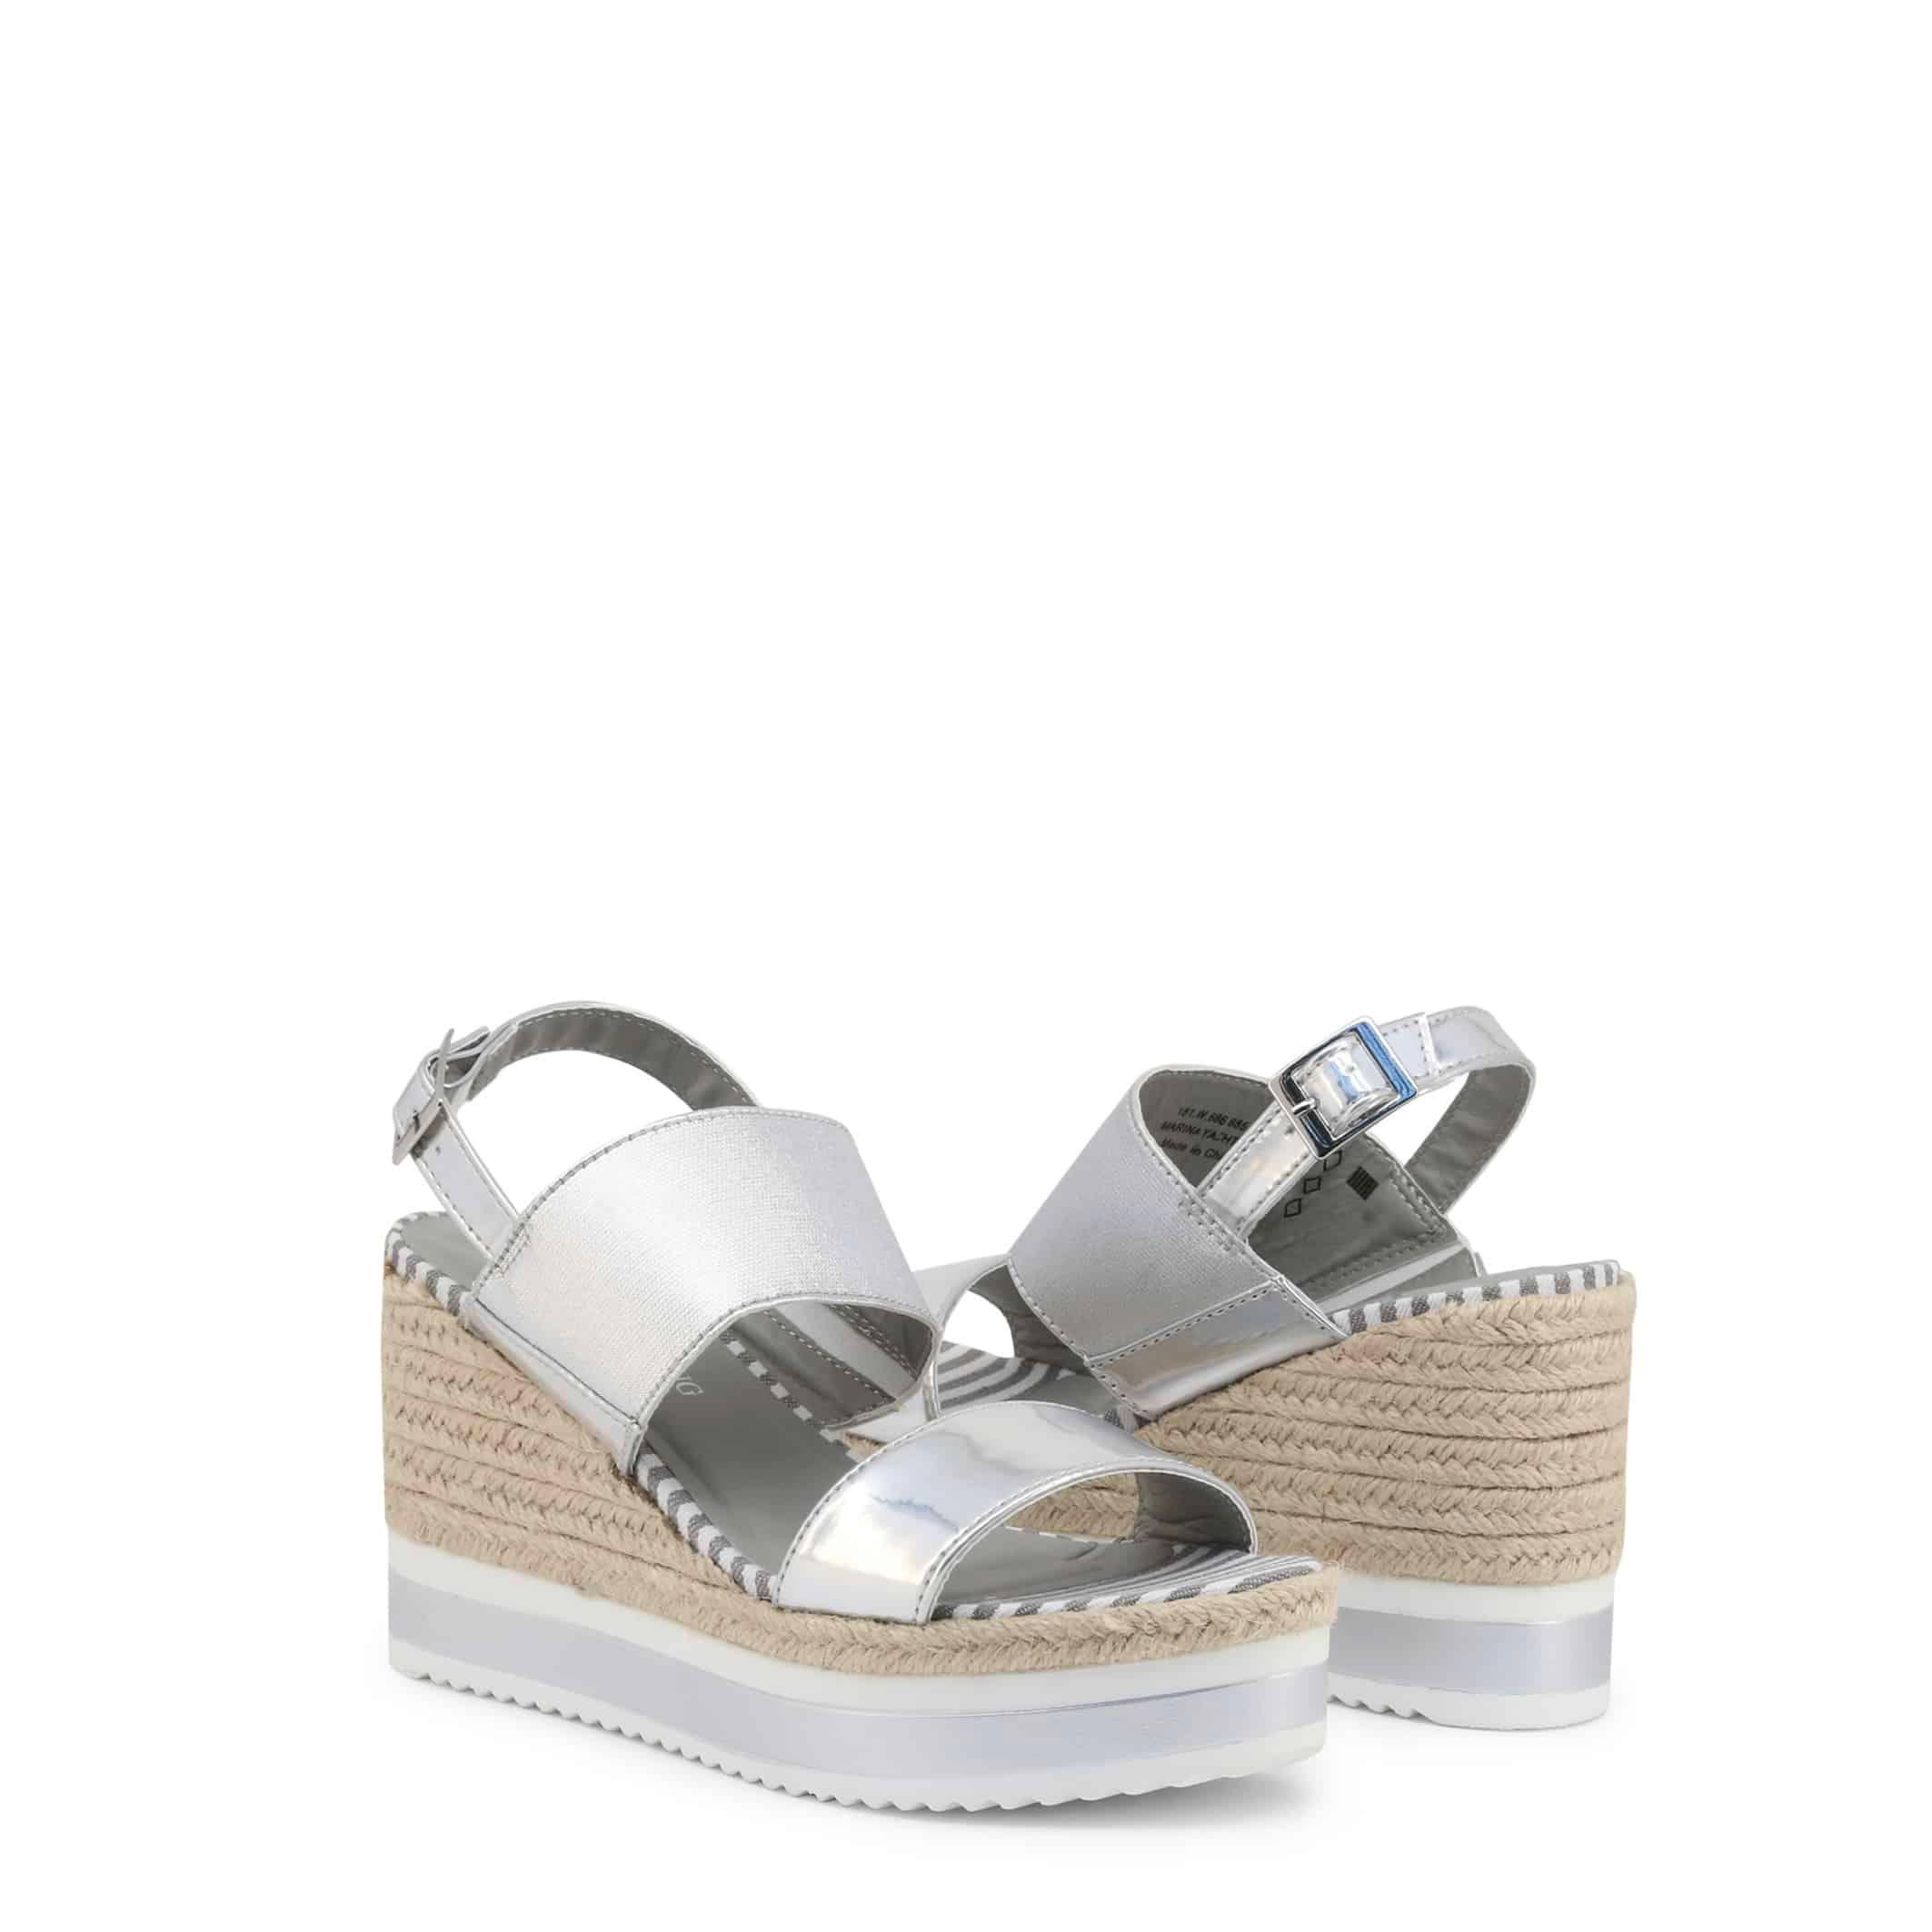 Marina Yachting - EUPHORIA181W686685  | You Fashion Outlet